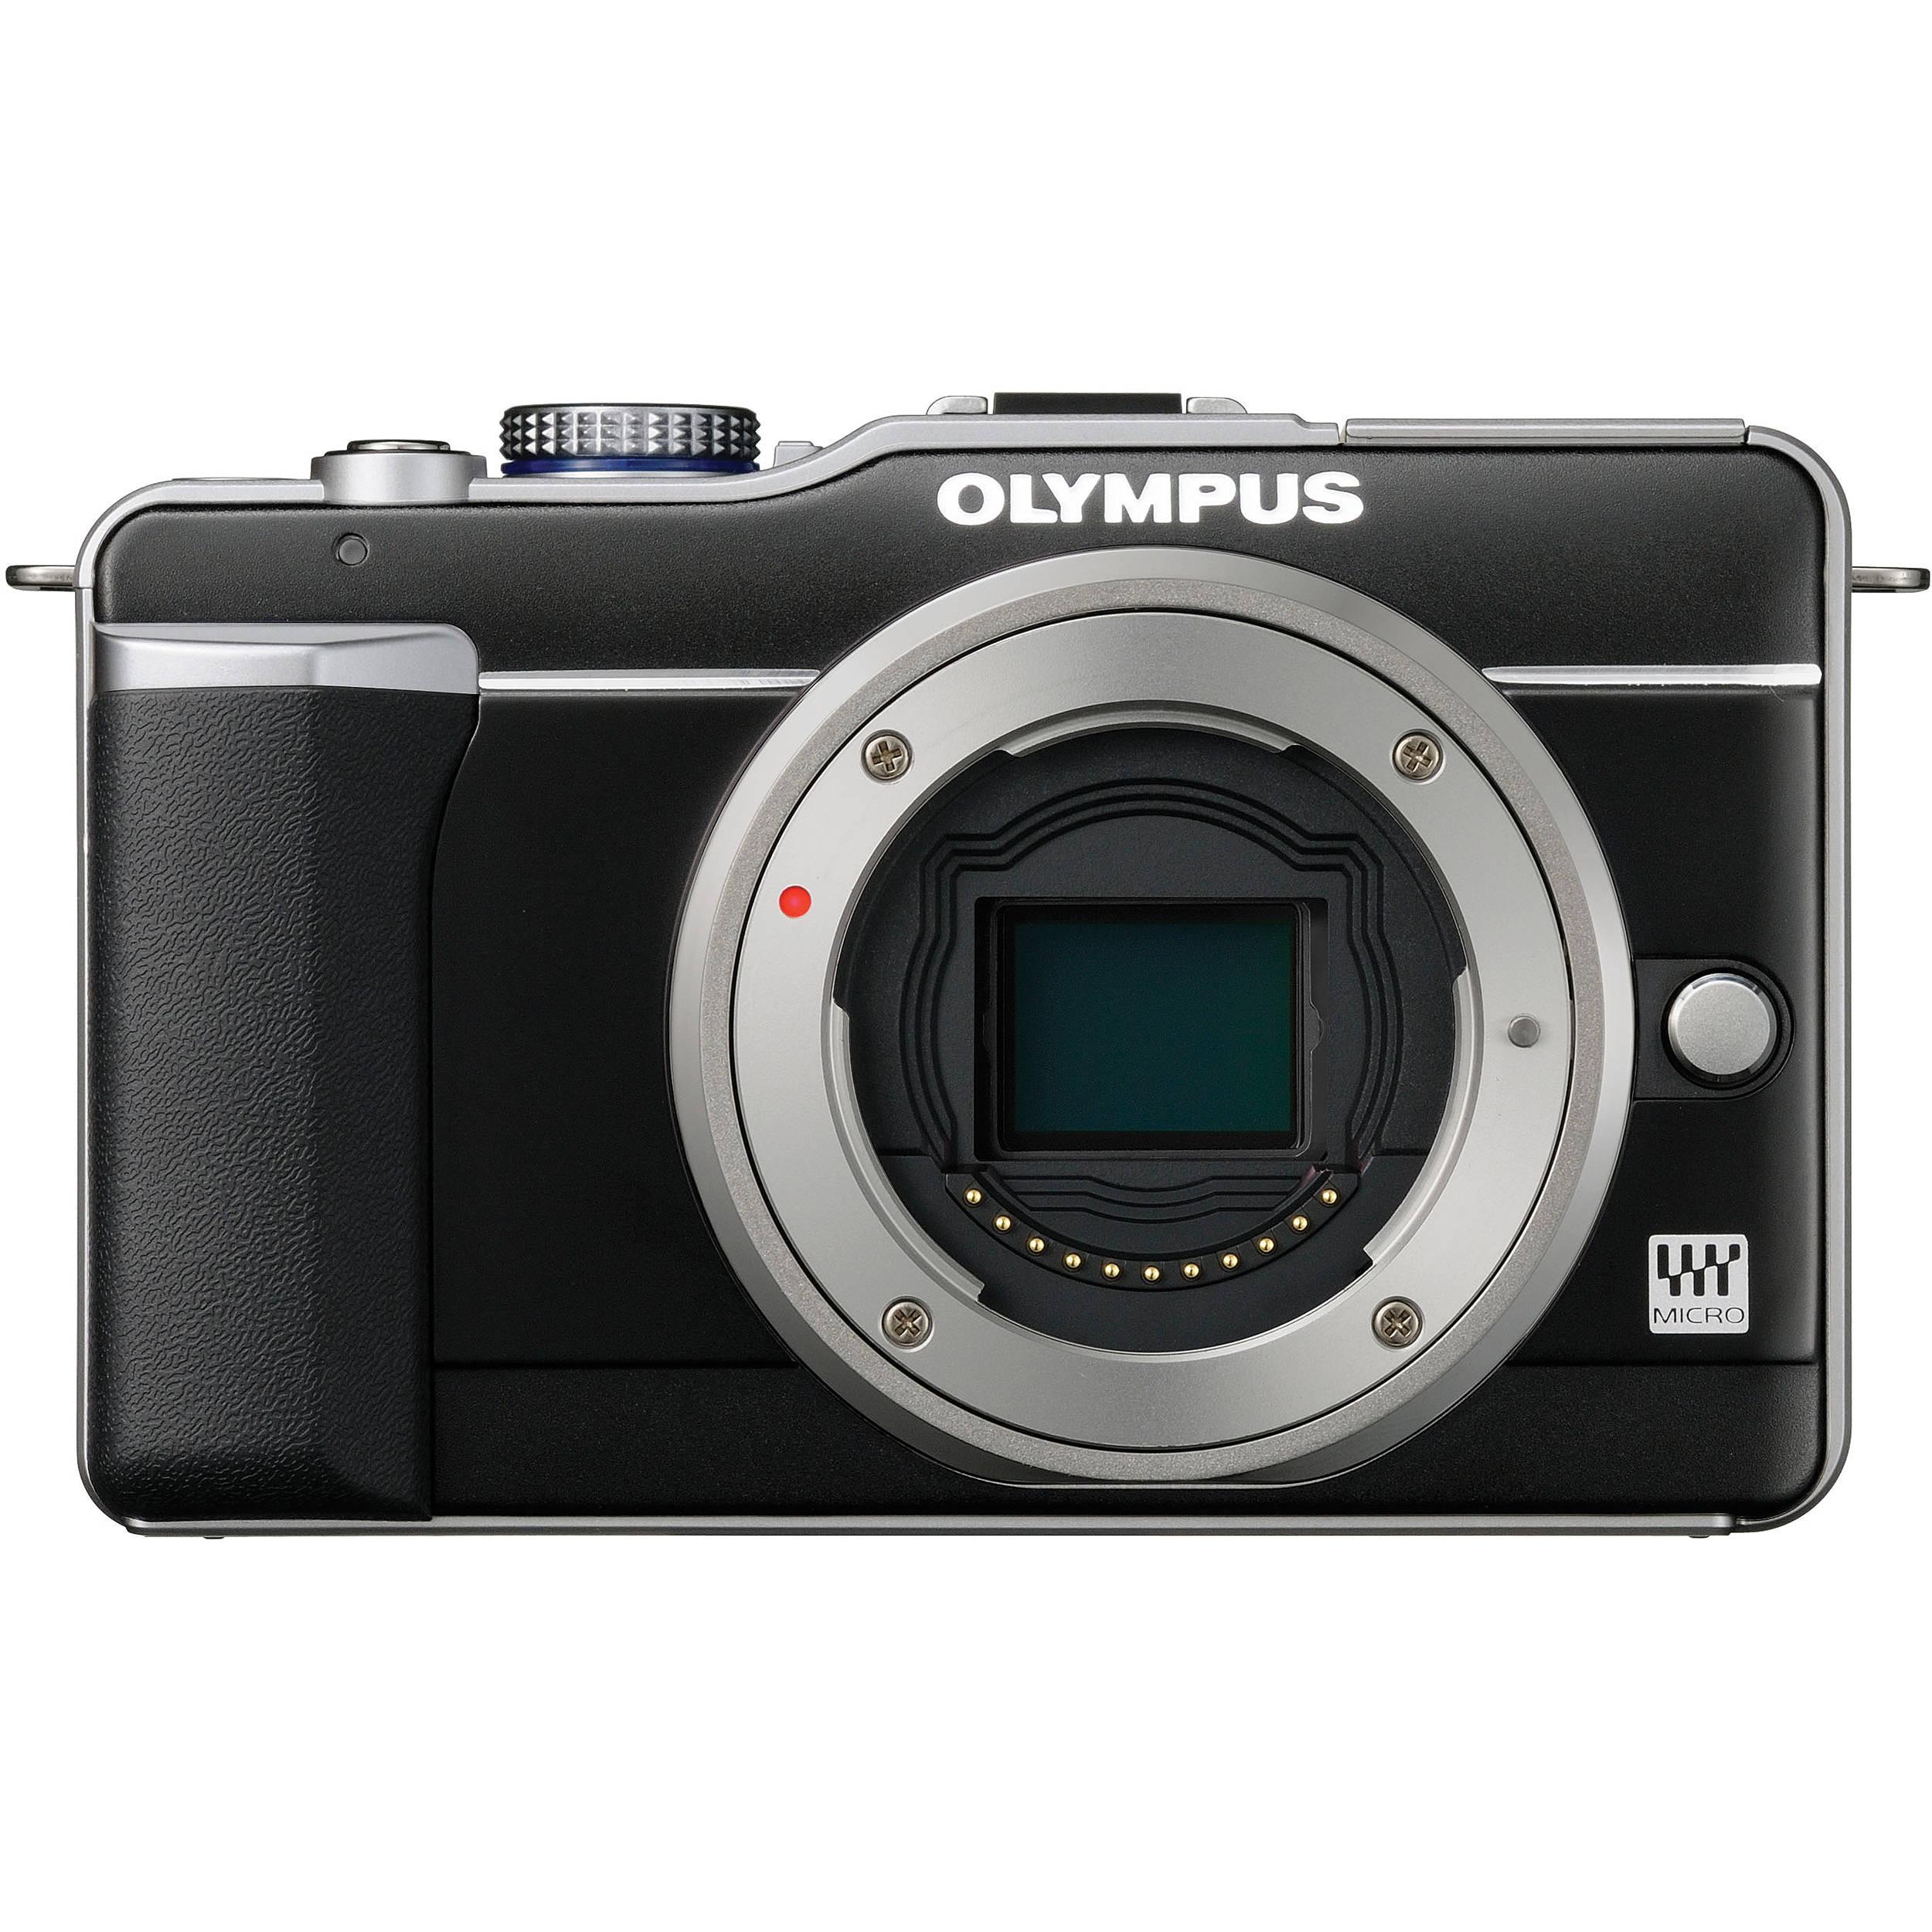 Fotocamera digitale olympus pen e-pl1 40